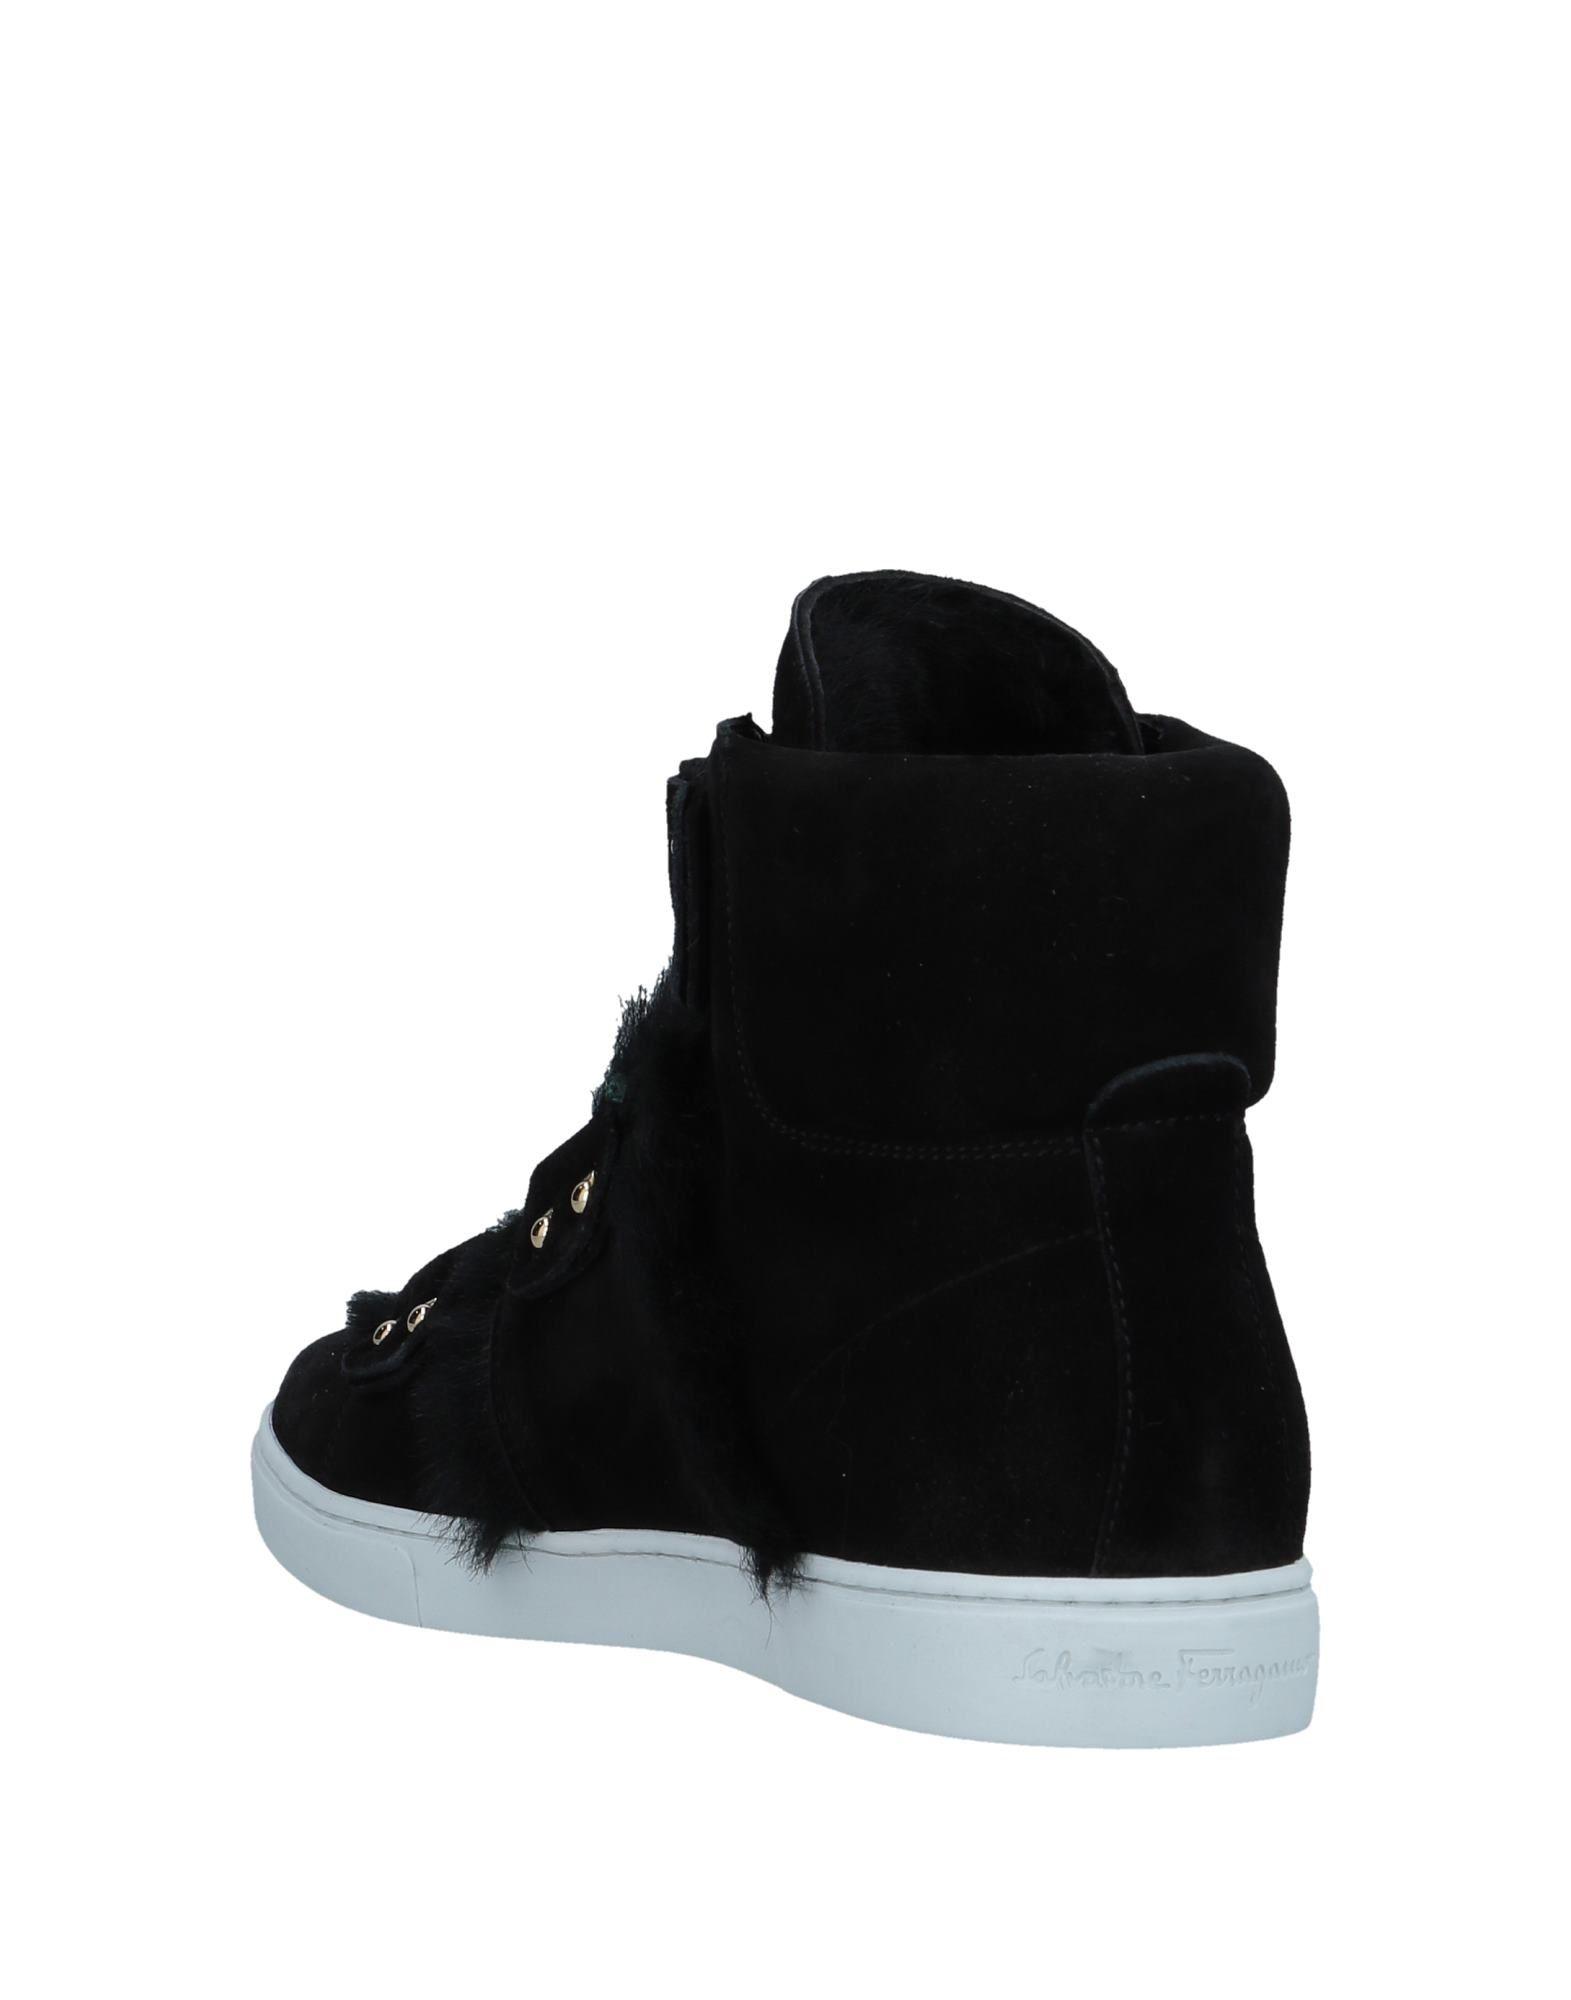 Salvatore Ferragamo Sneakers Damen aussehende  11523865ITGünstige gut aussehende Damen Schuhe 645d4d